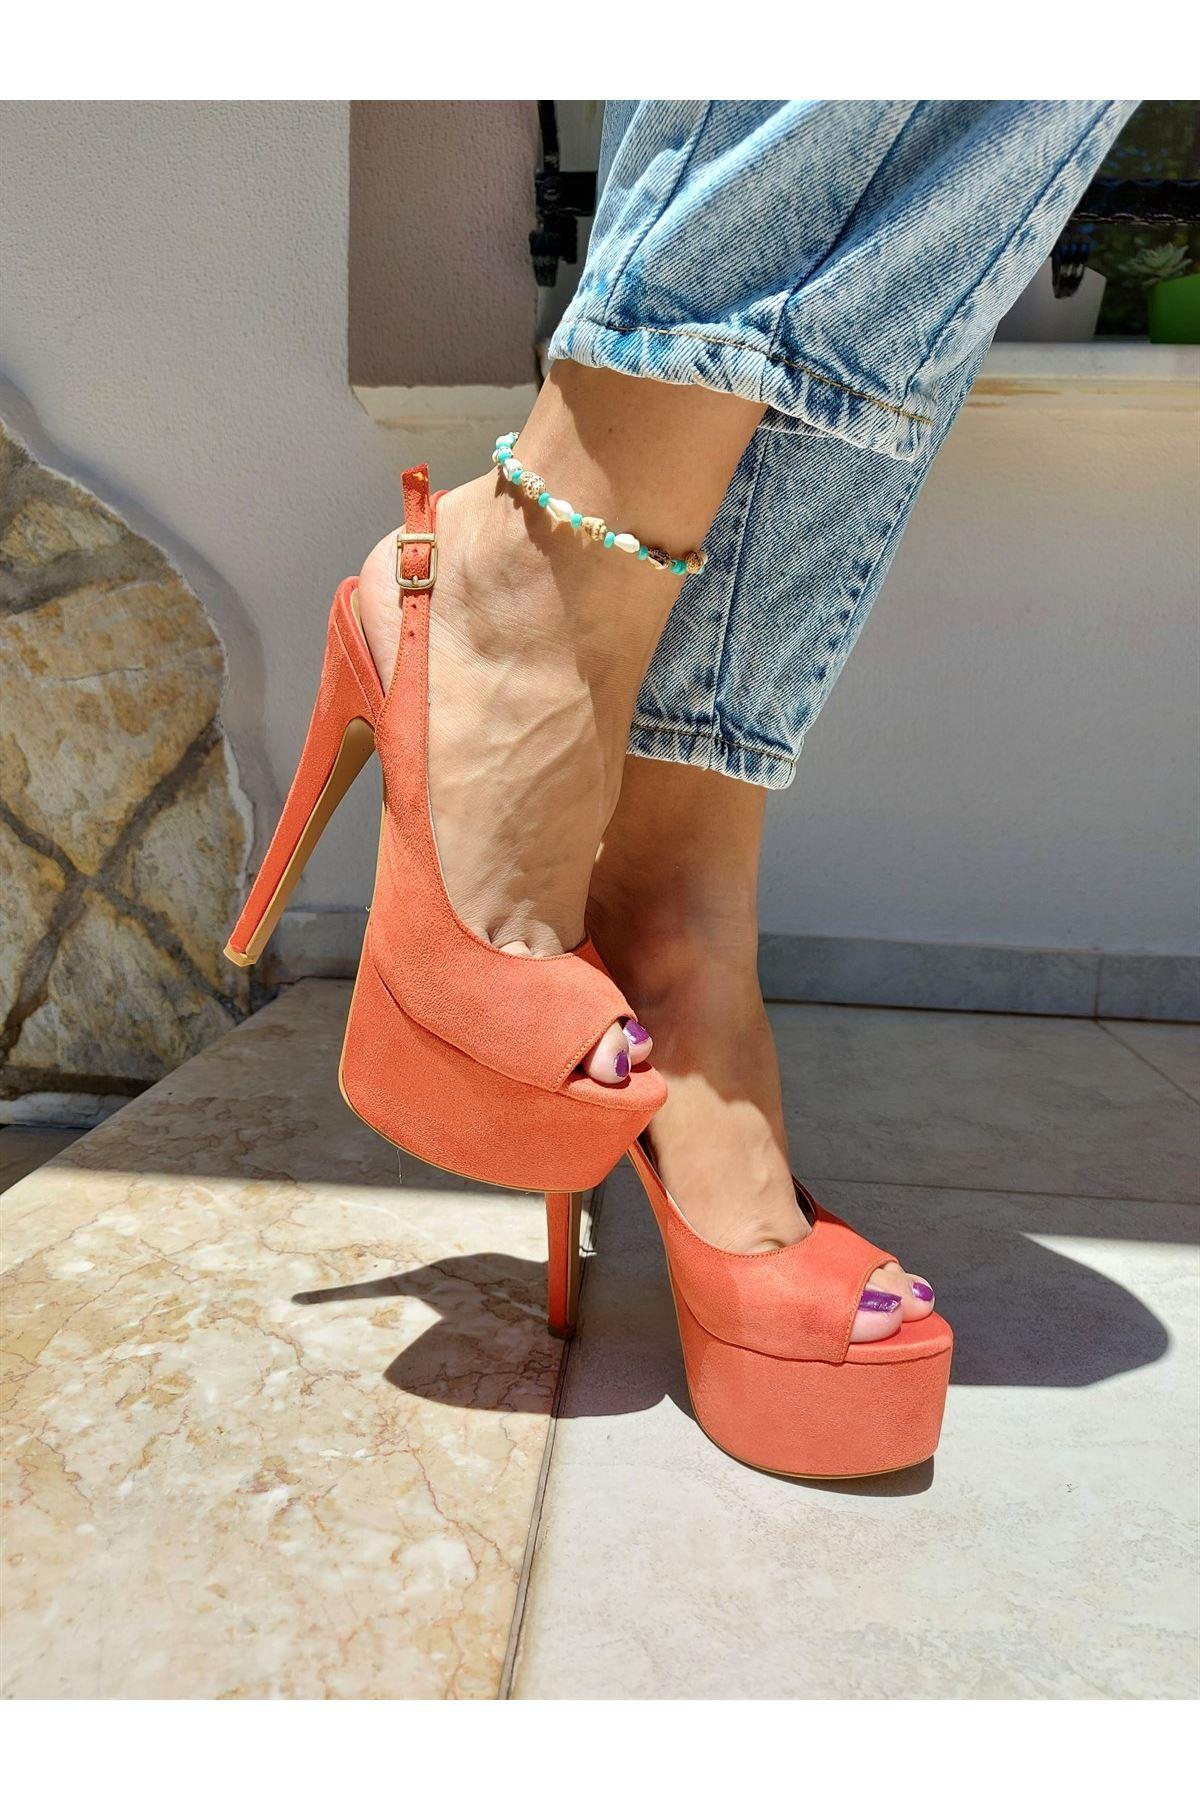 Ruby Turuncu Süet Yüksek Topuklu Ayakkabı